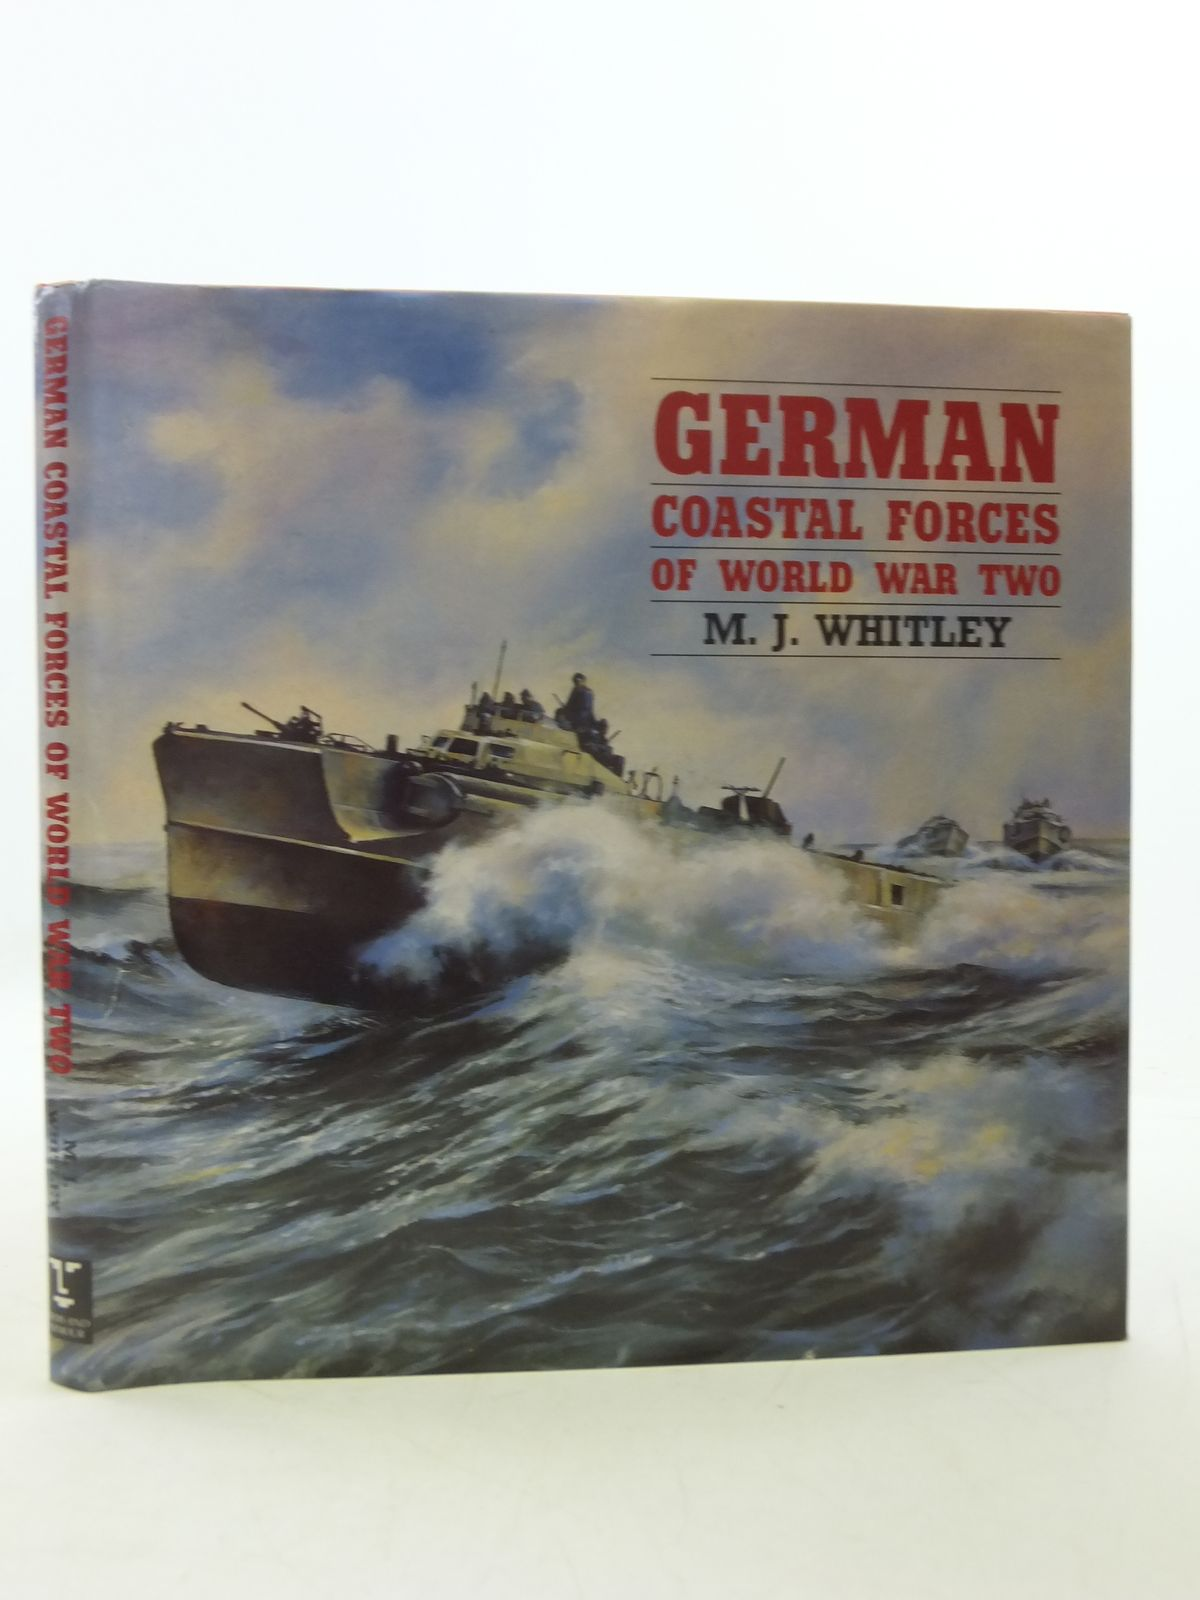 German Coastal Forces Of World War Two